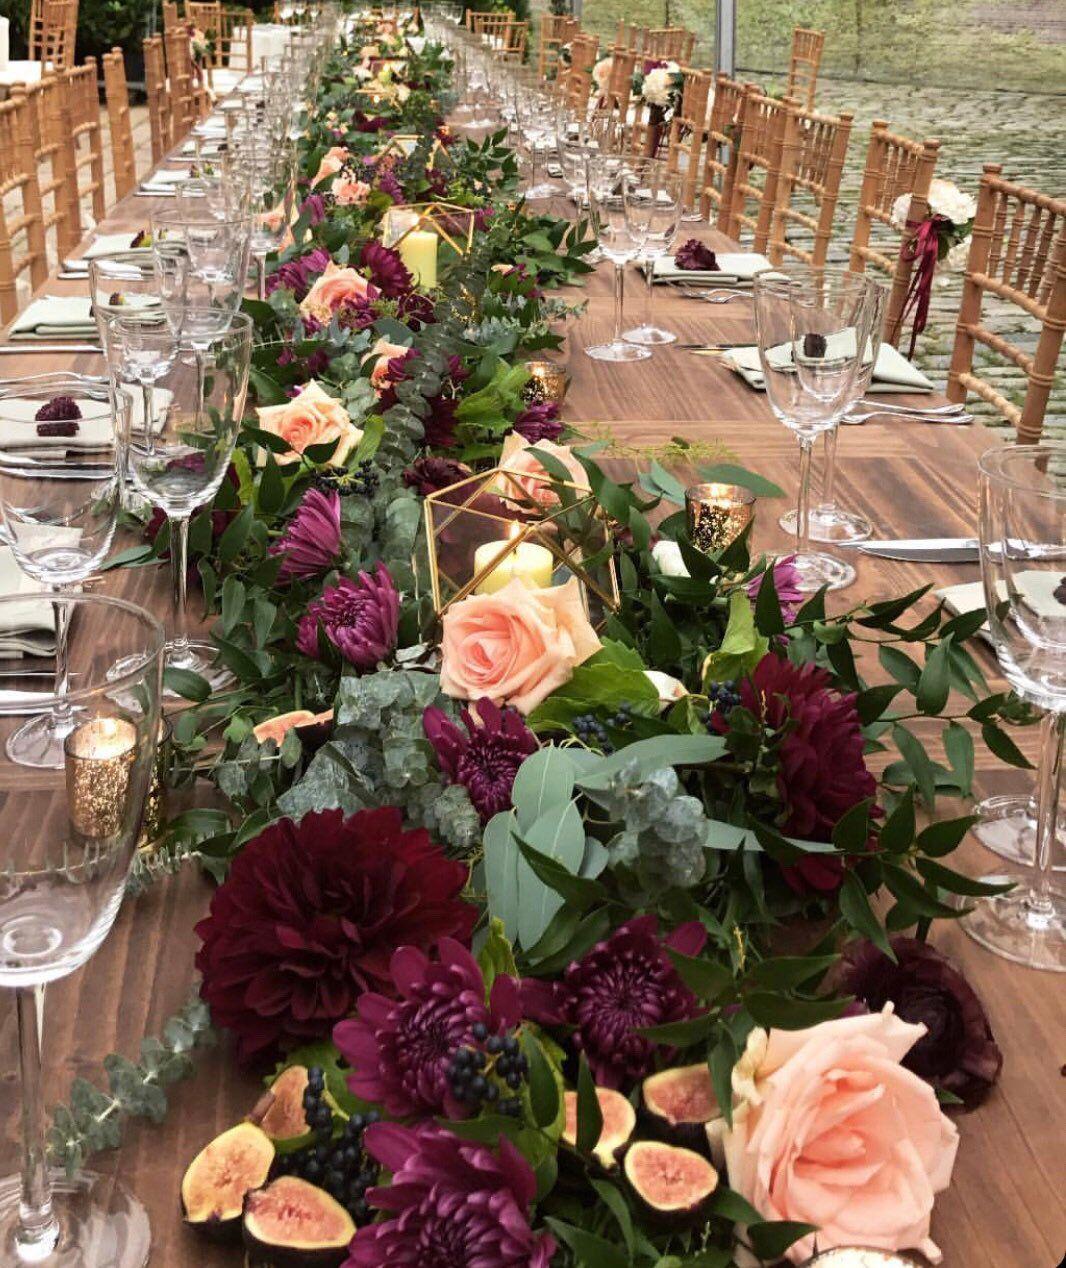 Gold Glass Candle Holder Gold Glass Terrarium Gold Glass Wedding Table Centerpi Wedding Table Centerpieces Wedding Floral Centerpieces Wedding Centerpieces